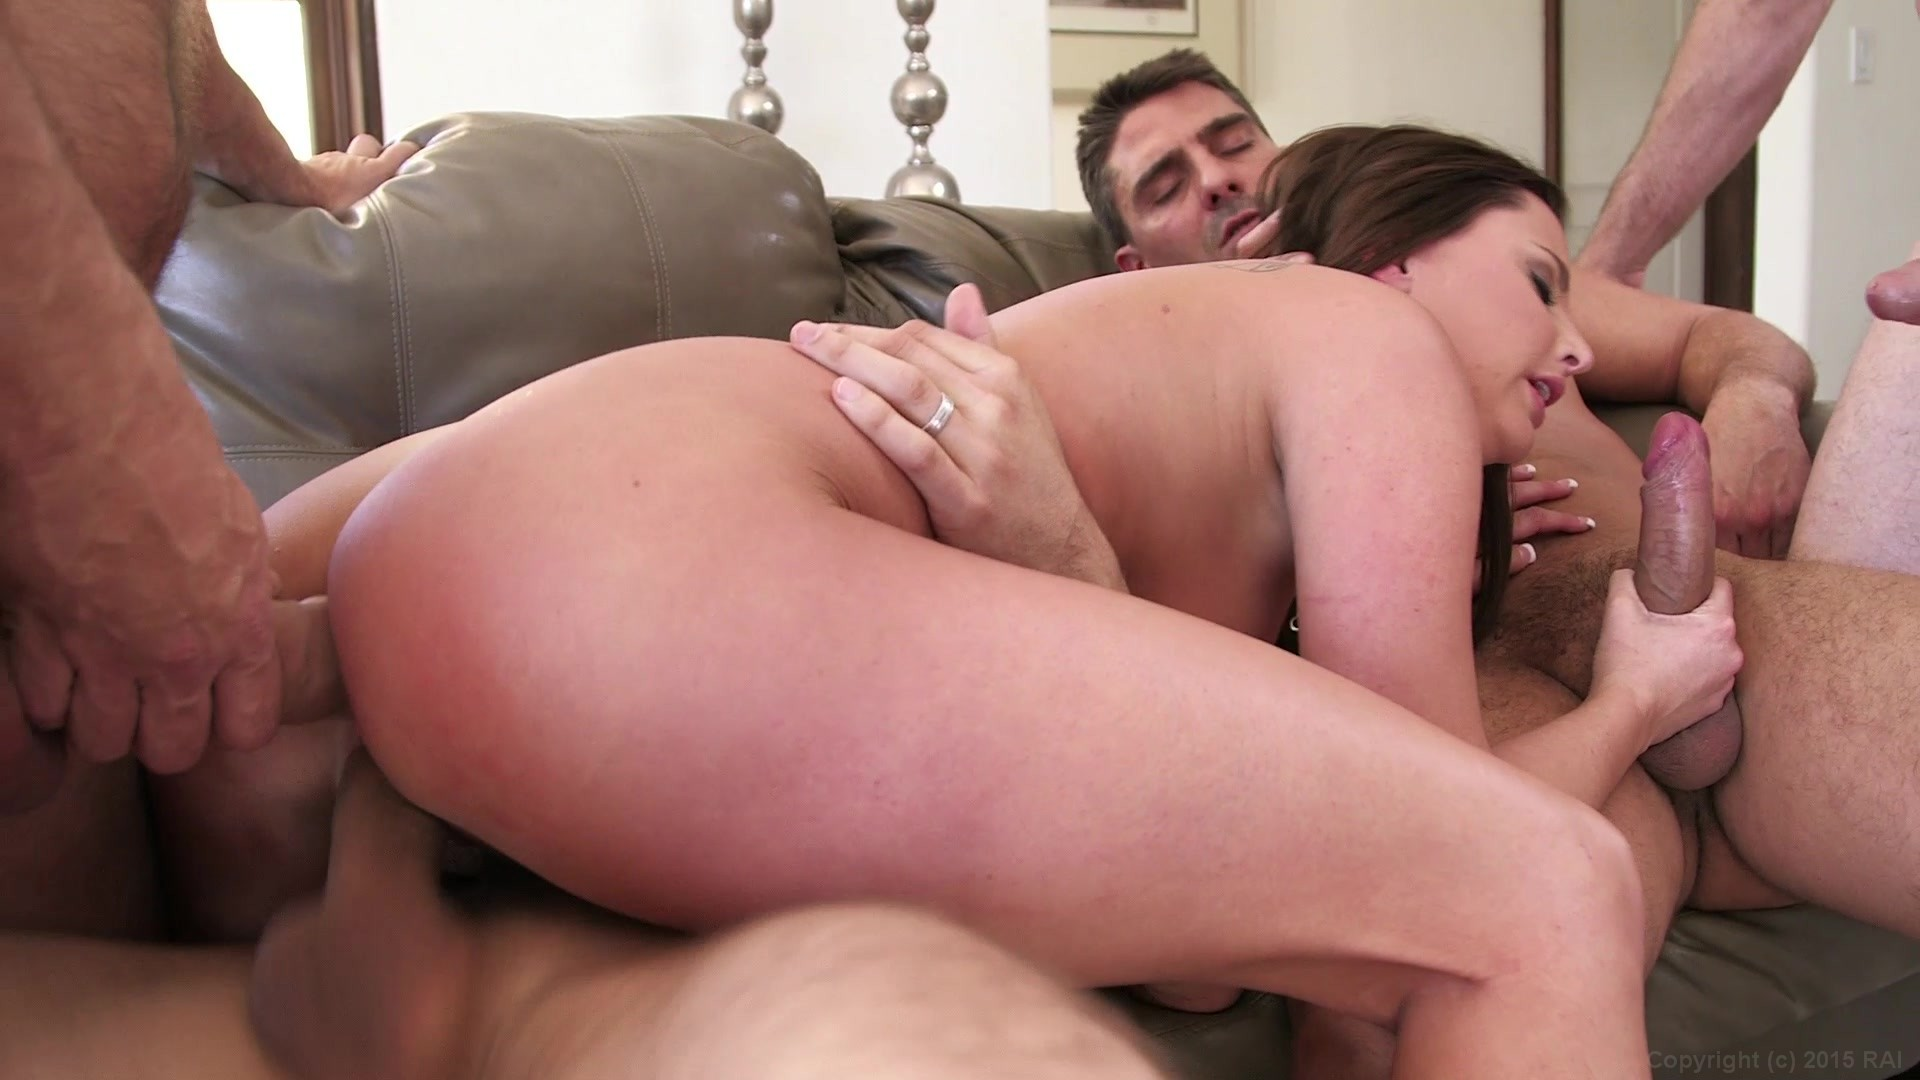 kelly preston movie sex scene